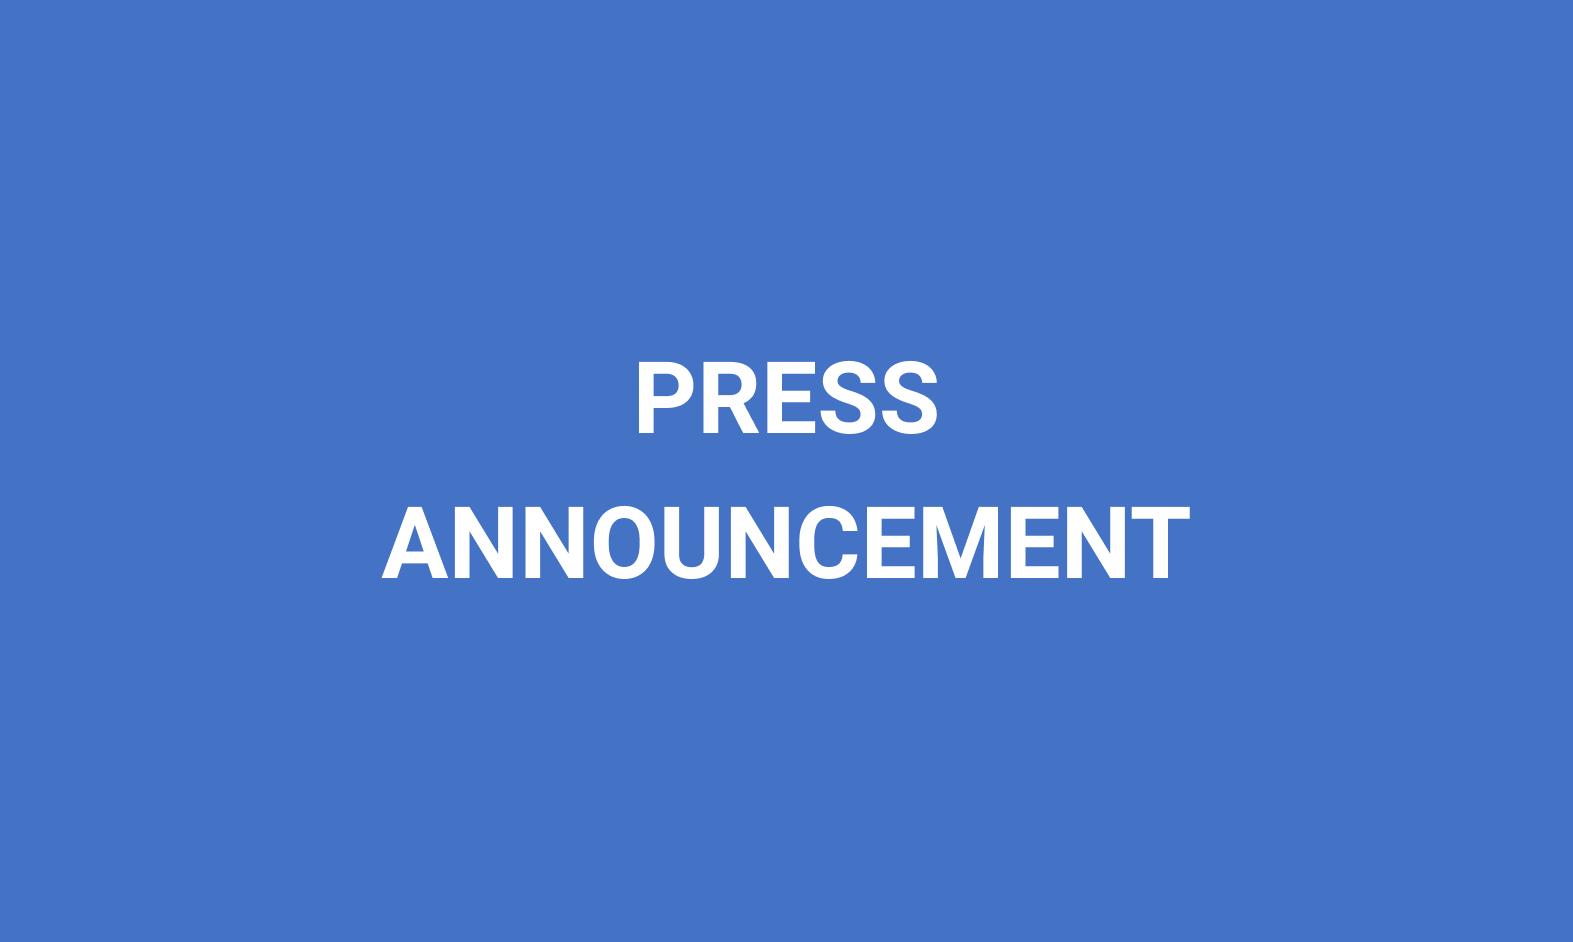 PRESS RELEASE: UK Telecoms companies embrace digital transformation using SiteSee